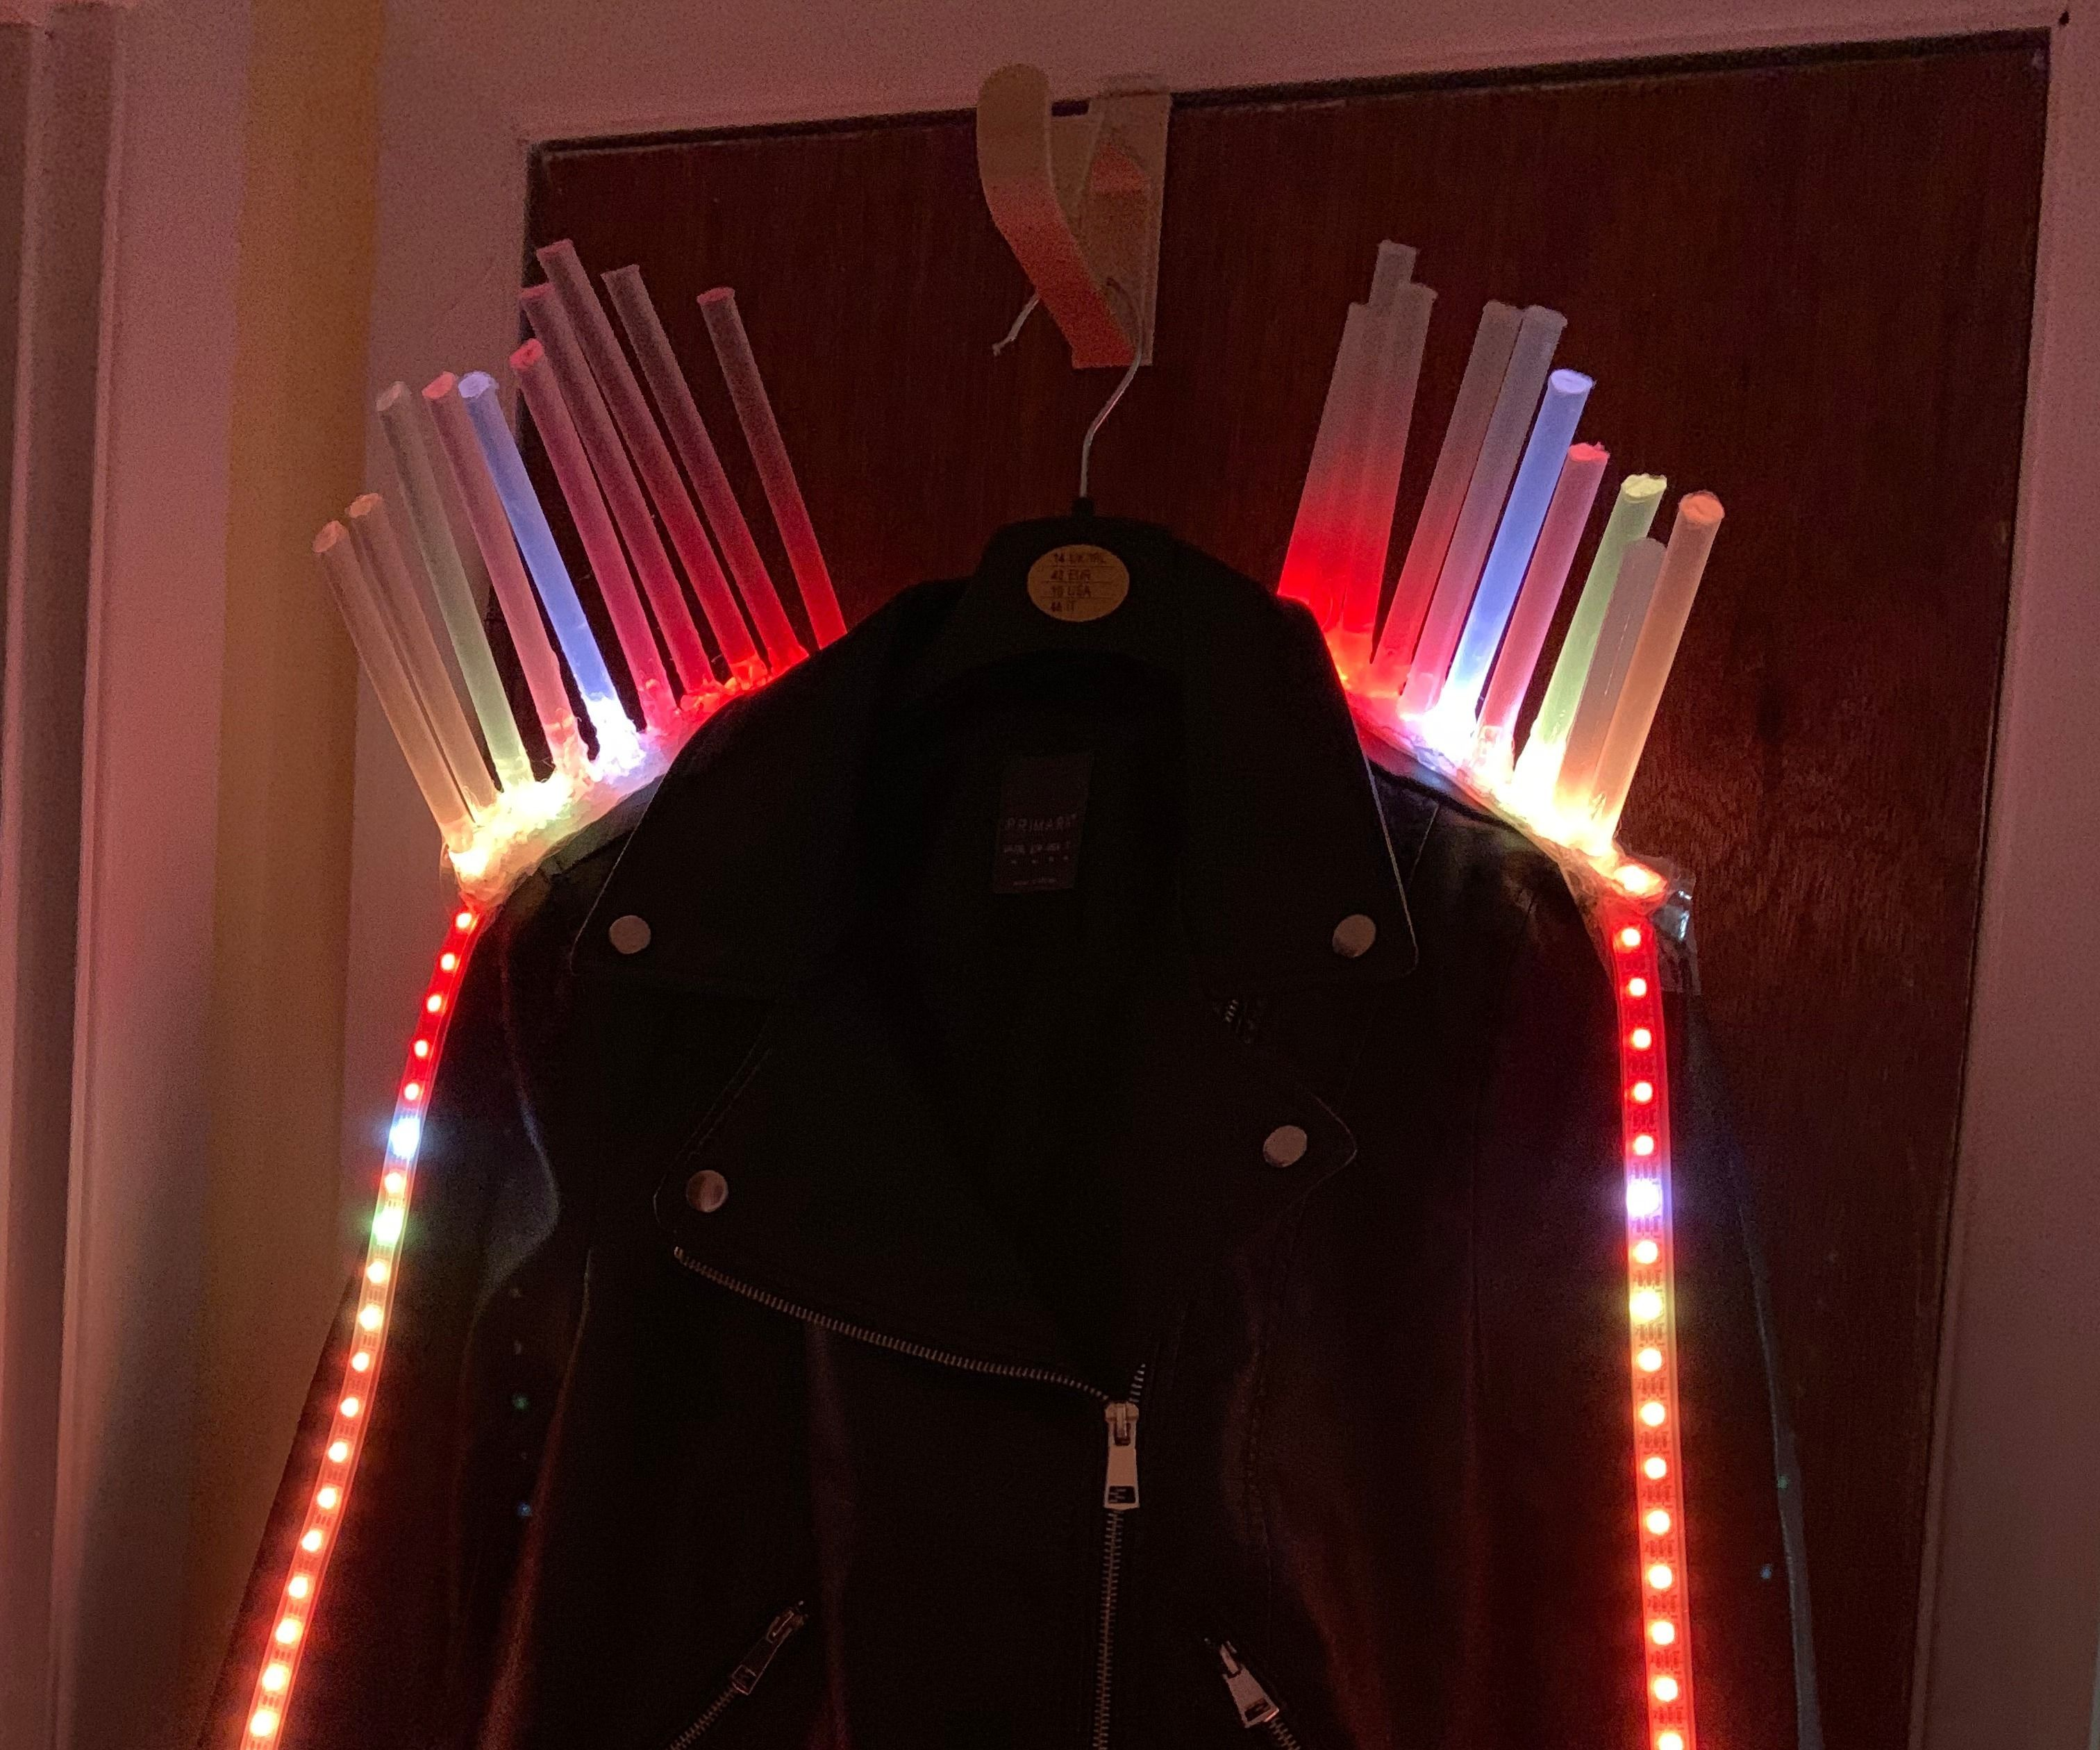 Neopixel Light Up Glue Sticks - Sophylights